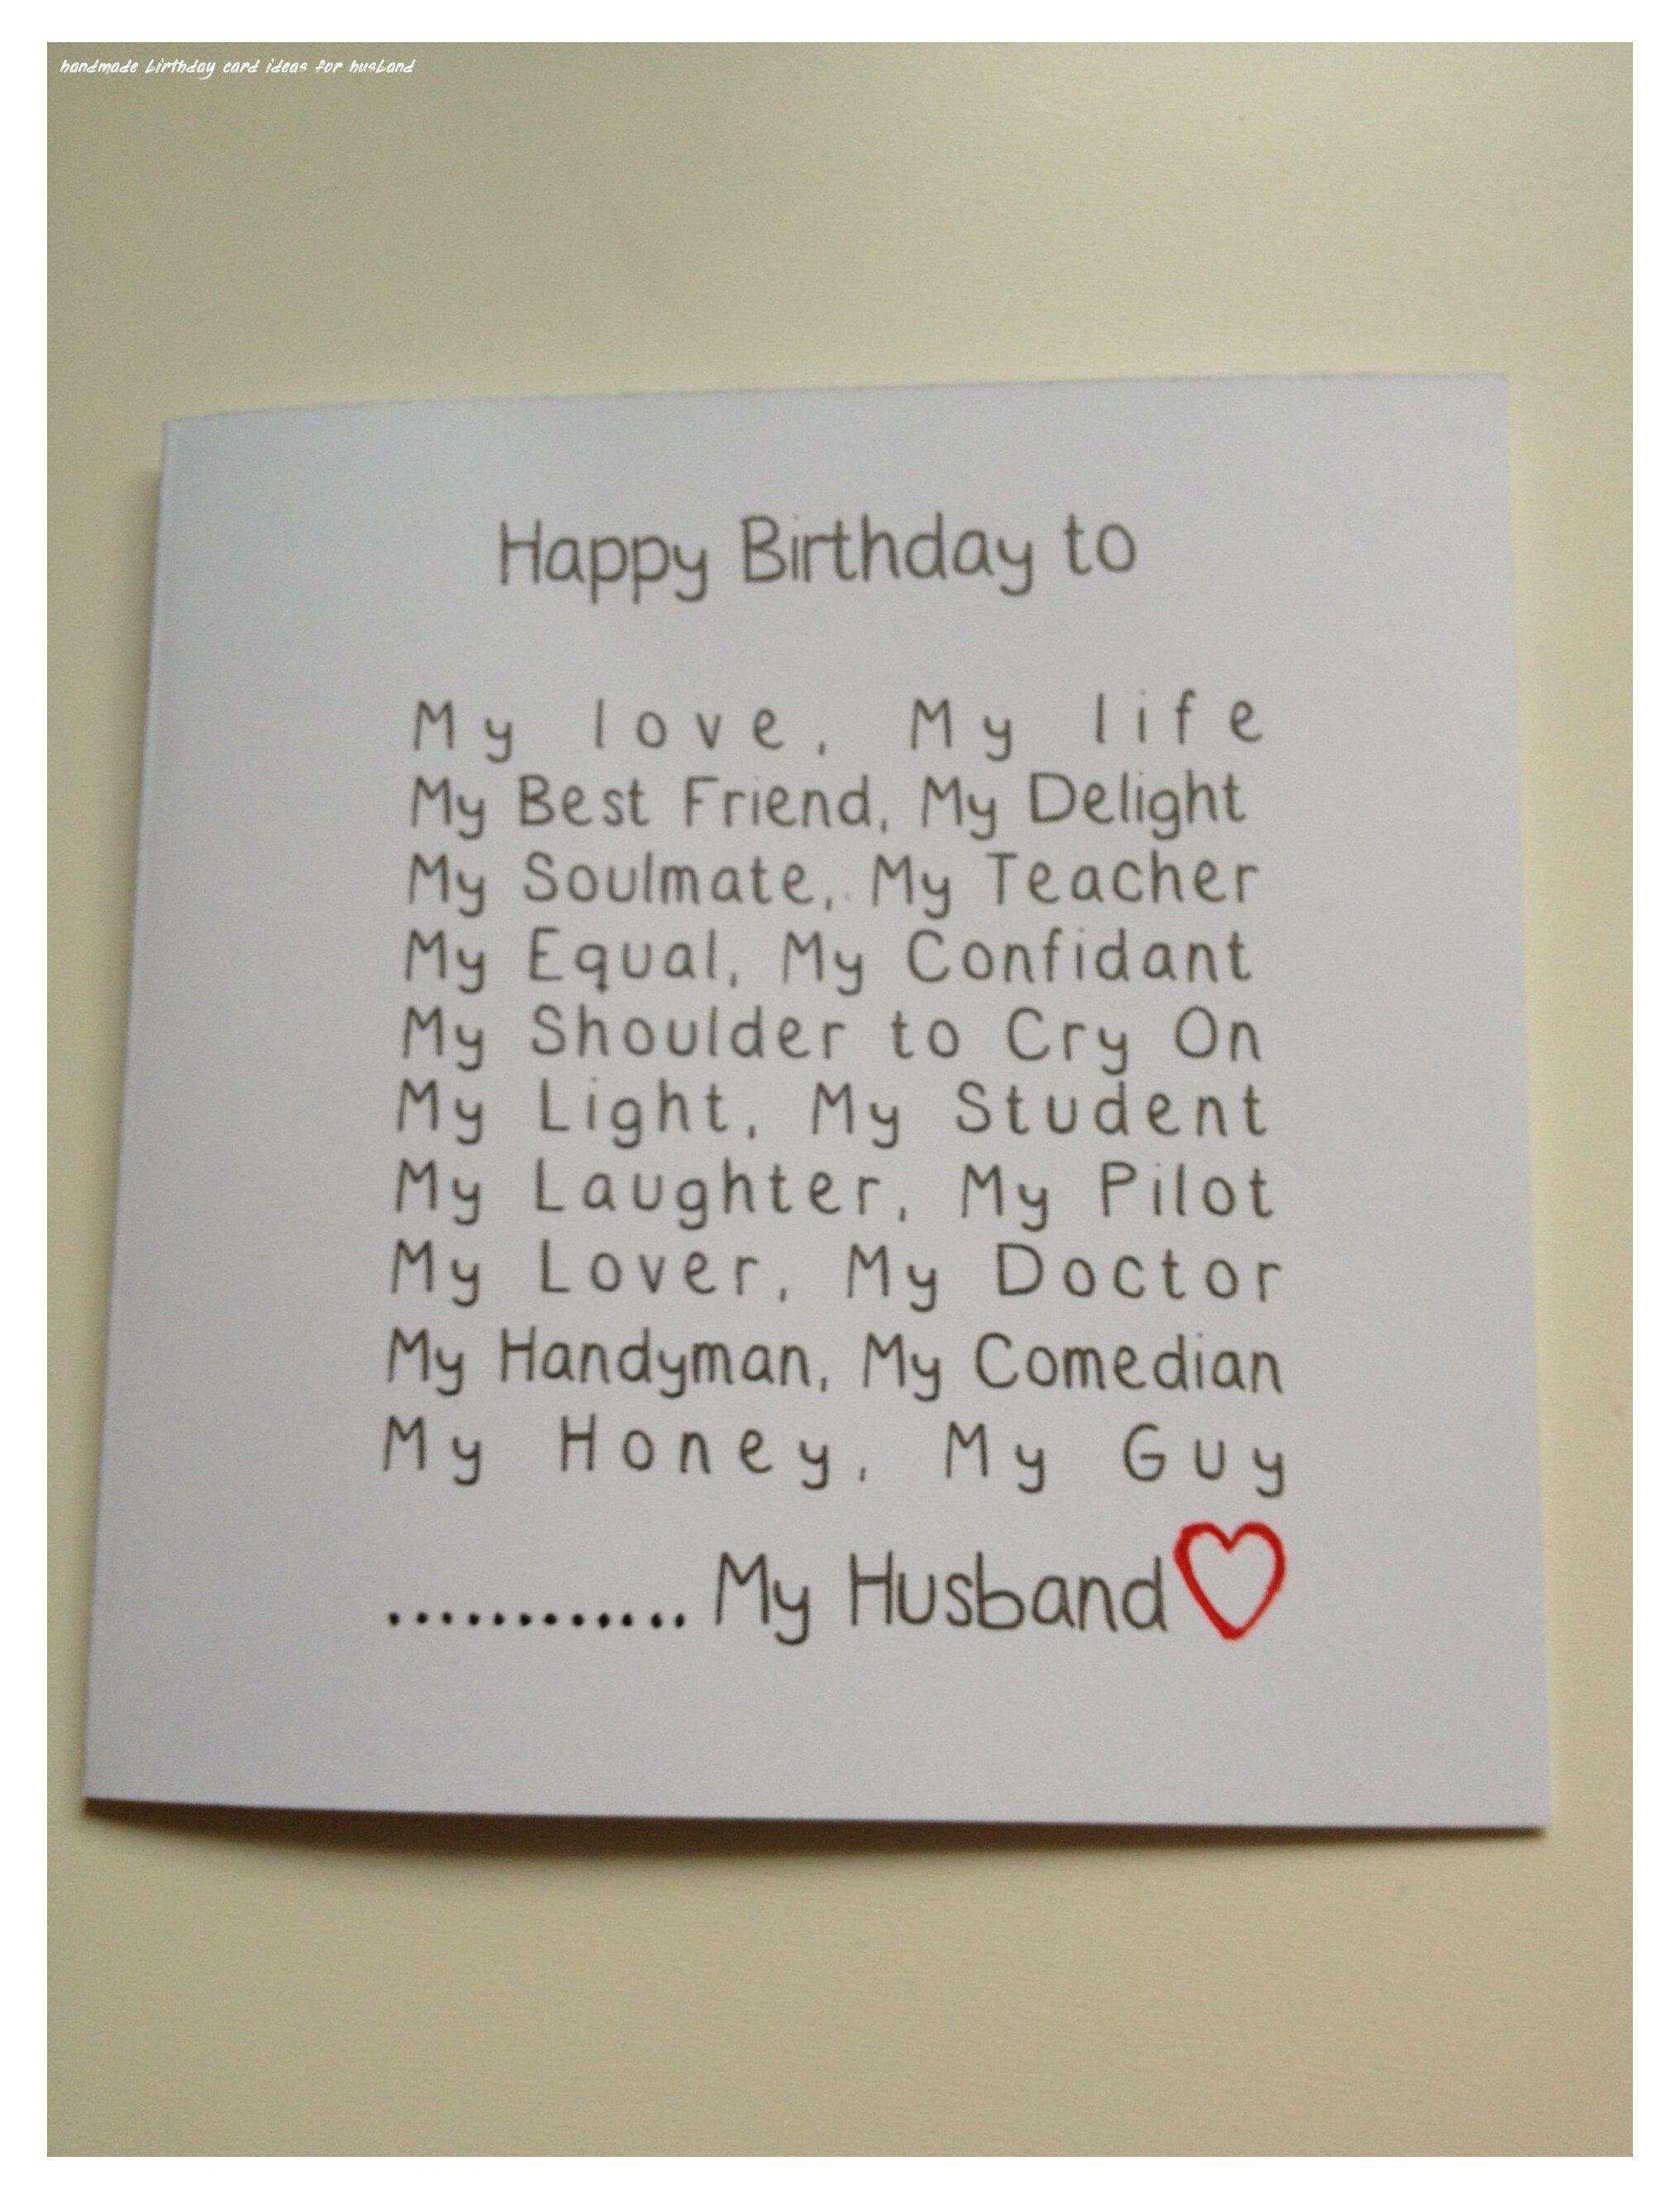 Pin By Kaytee Swarovski On Gift Ideas In 2021 Husband Birthday Card Birthday Cards For Boyfriend Birthday Surprise Husband